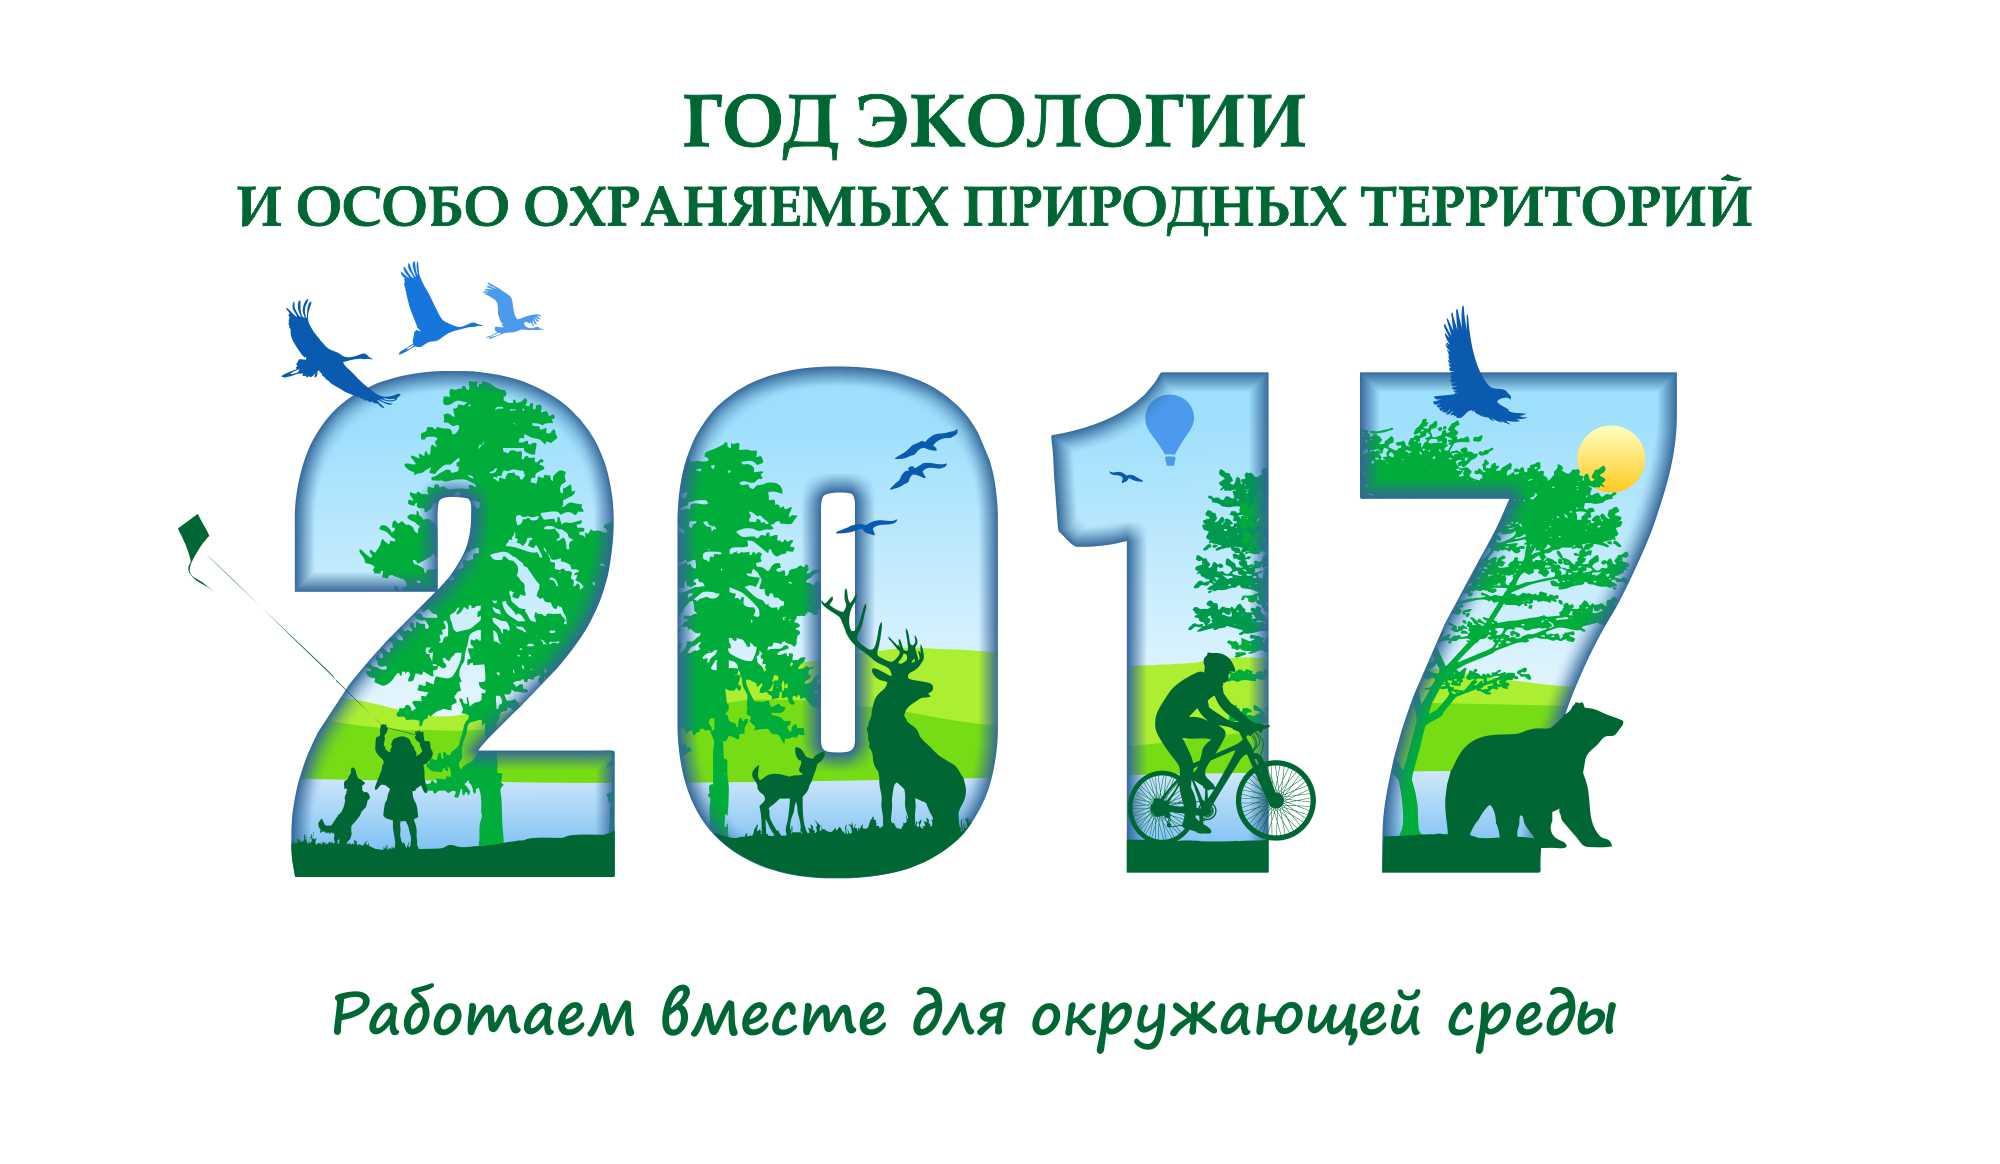 Картинки по запросу год экологии картинки